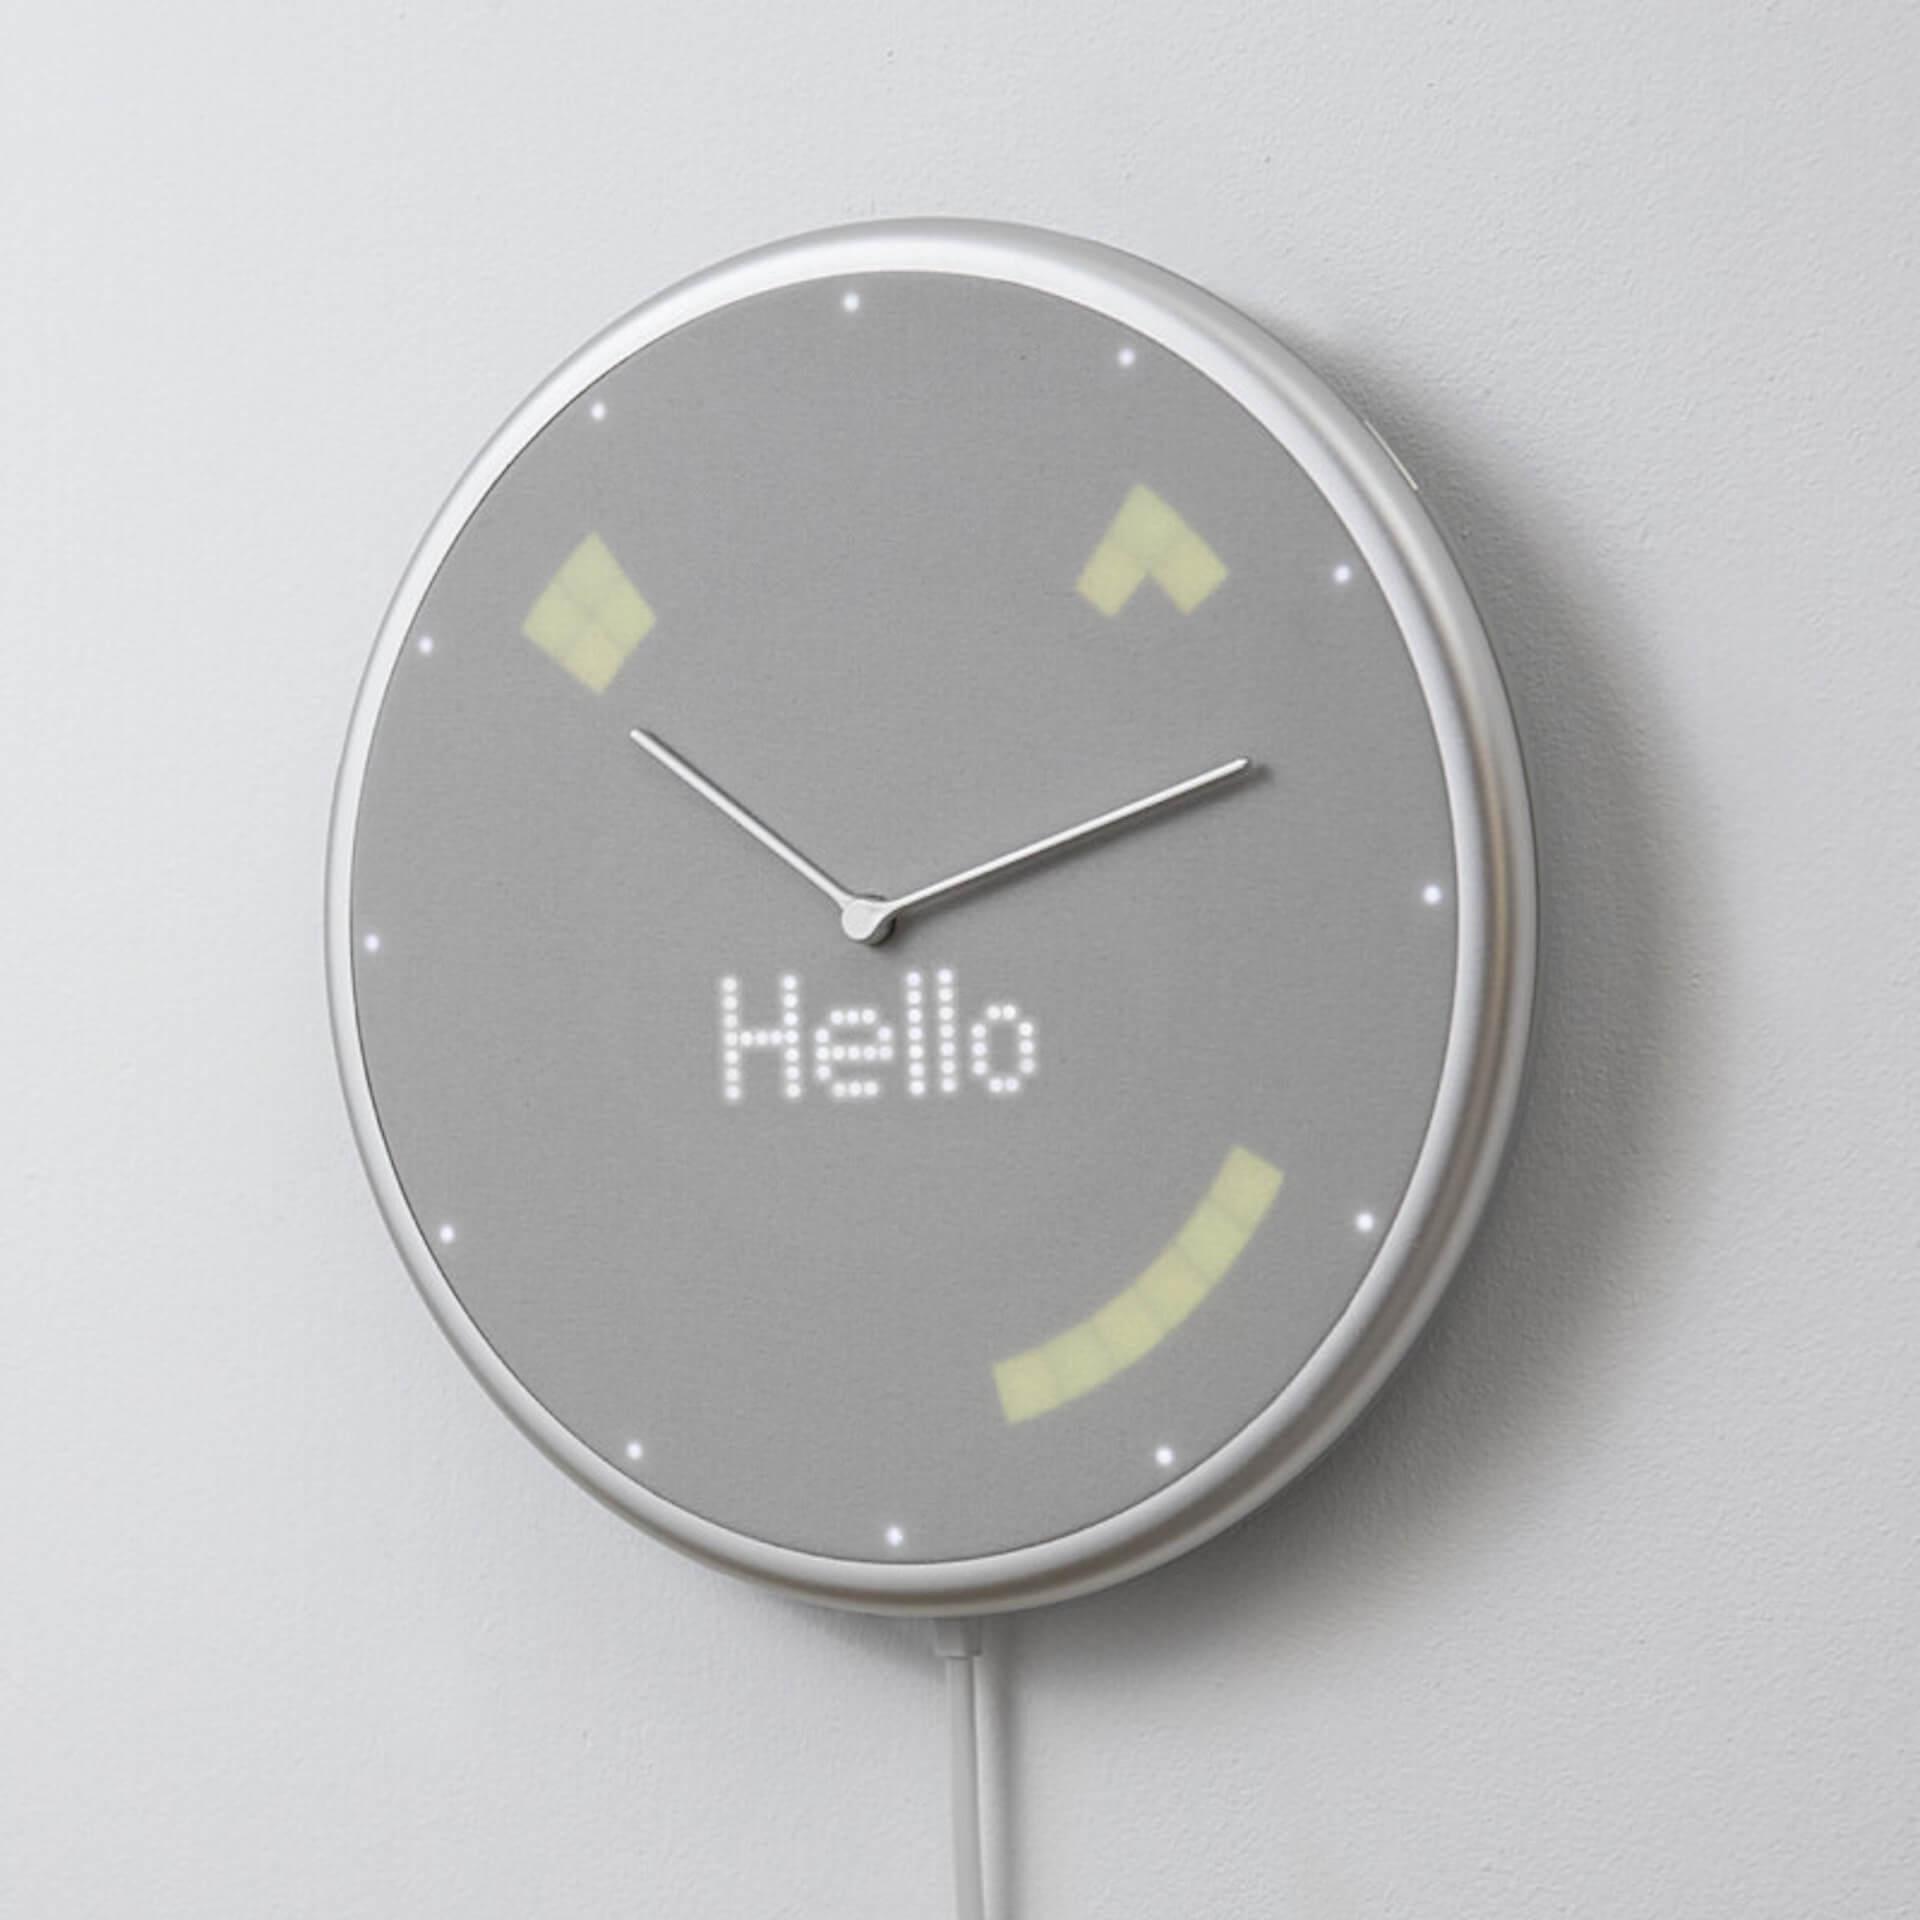 Google・Apple同期でスケジュール管理|忙しい日常をサポートするIoT掛け時計「Glance Clock」が登場 tech190904glanceclock_1